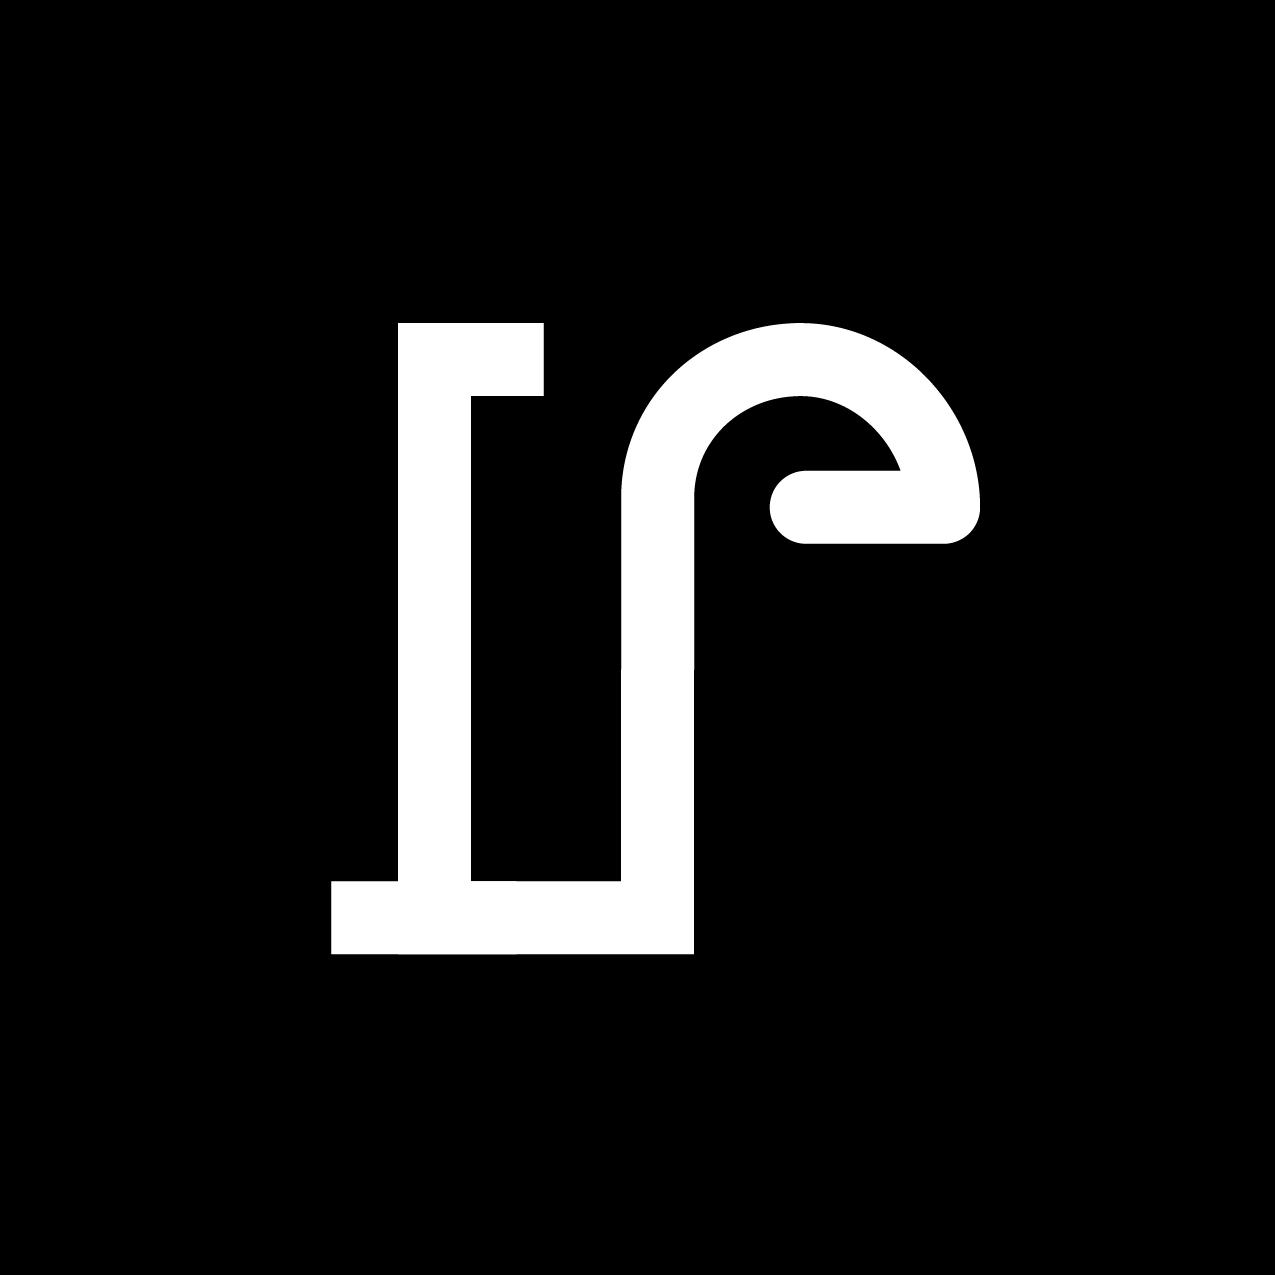 Letter R7 Design by Furia